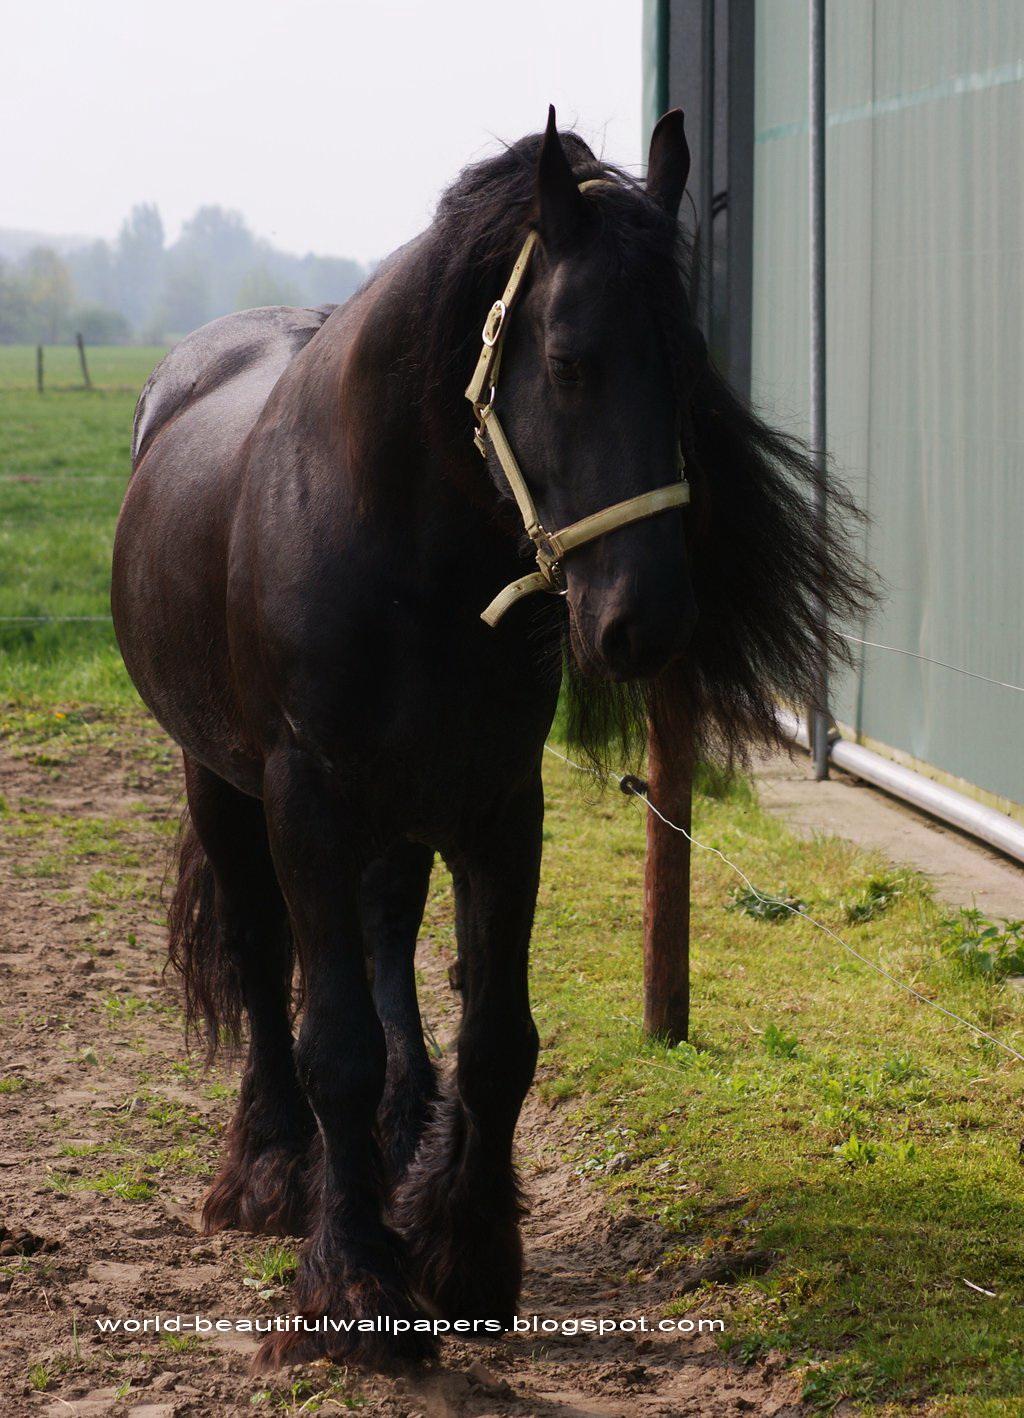 Stihl horse user on pof dating site